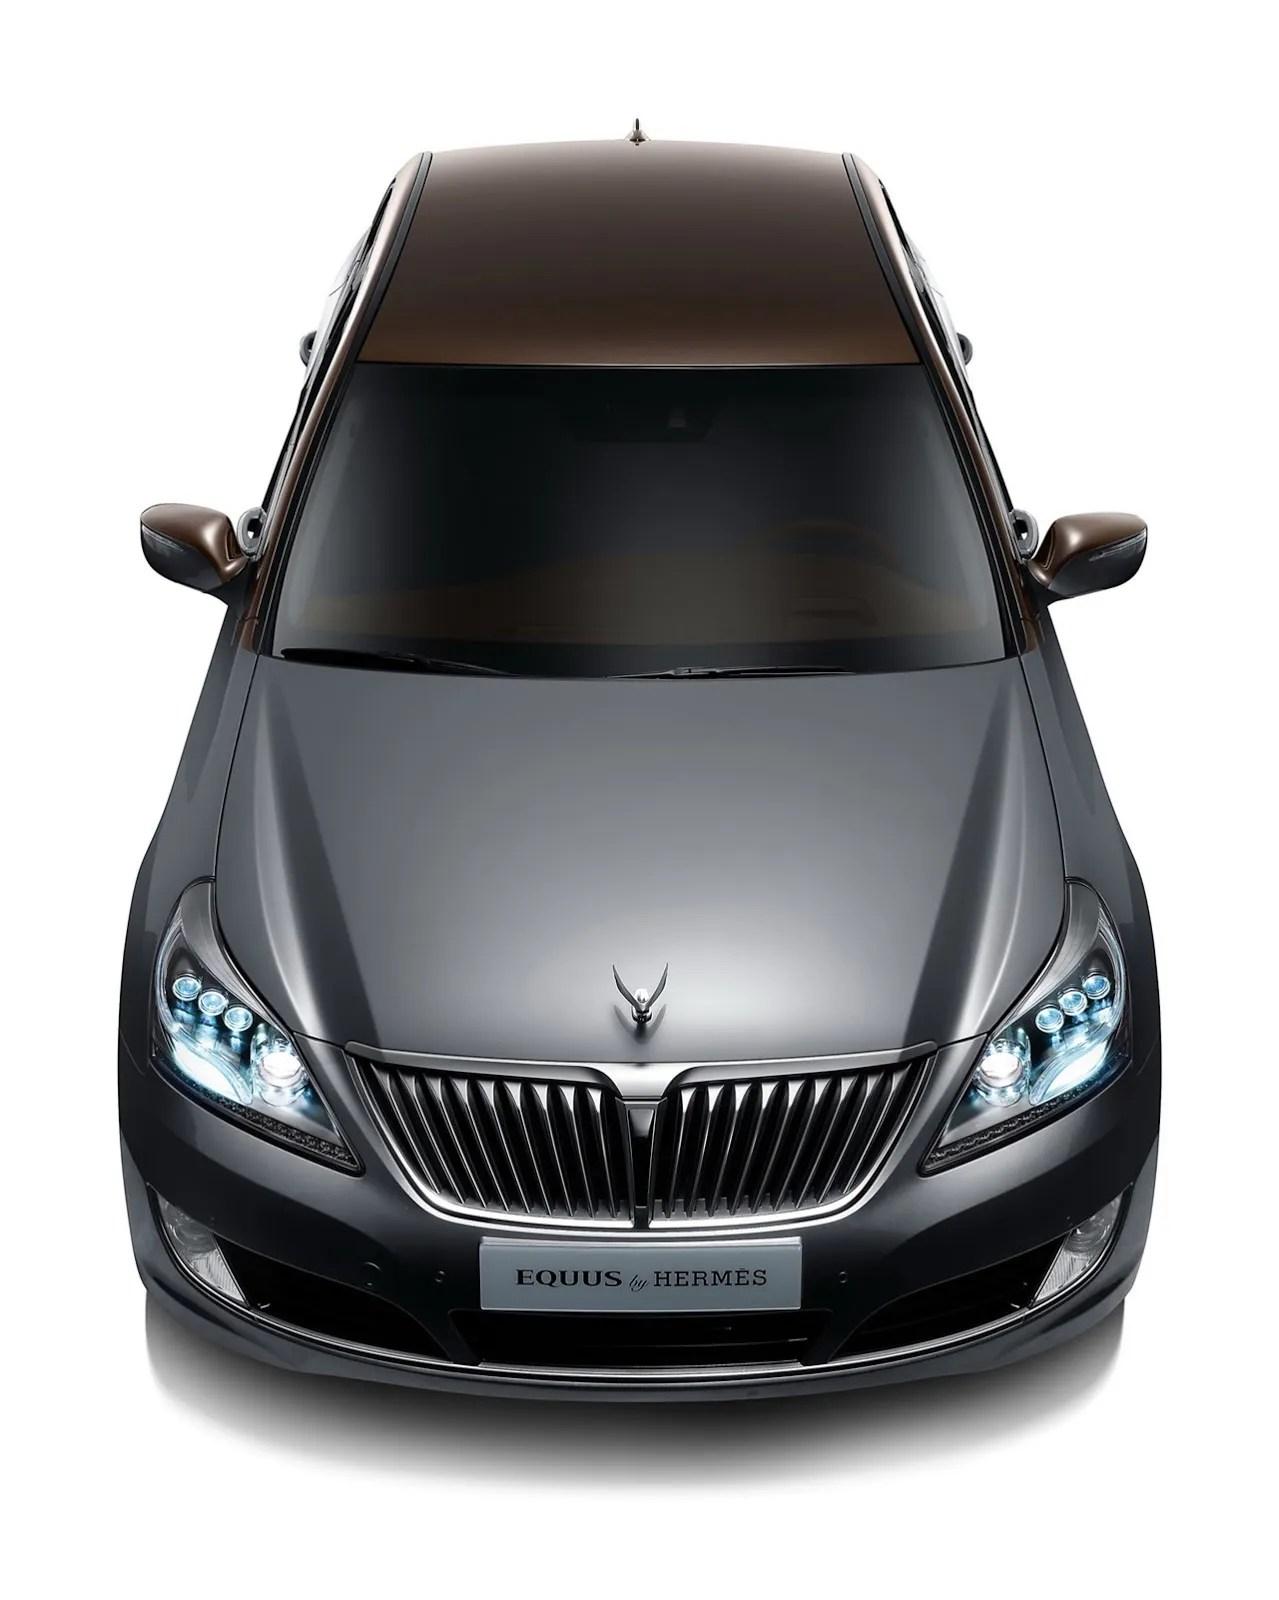 2013 Hyundai Equus Hermes Edition Review Top Speed